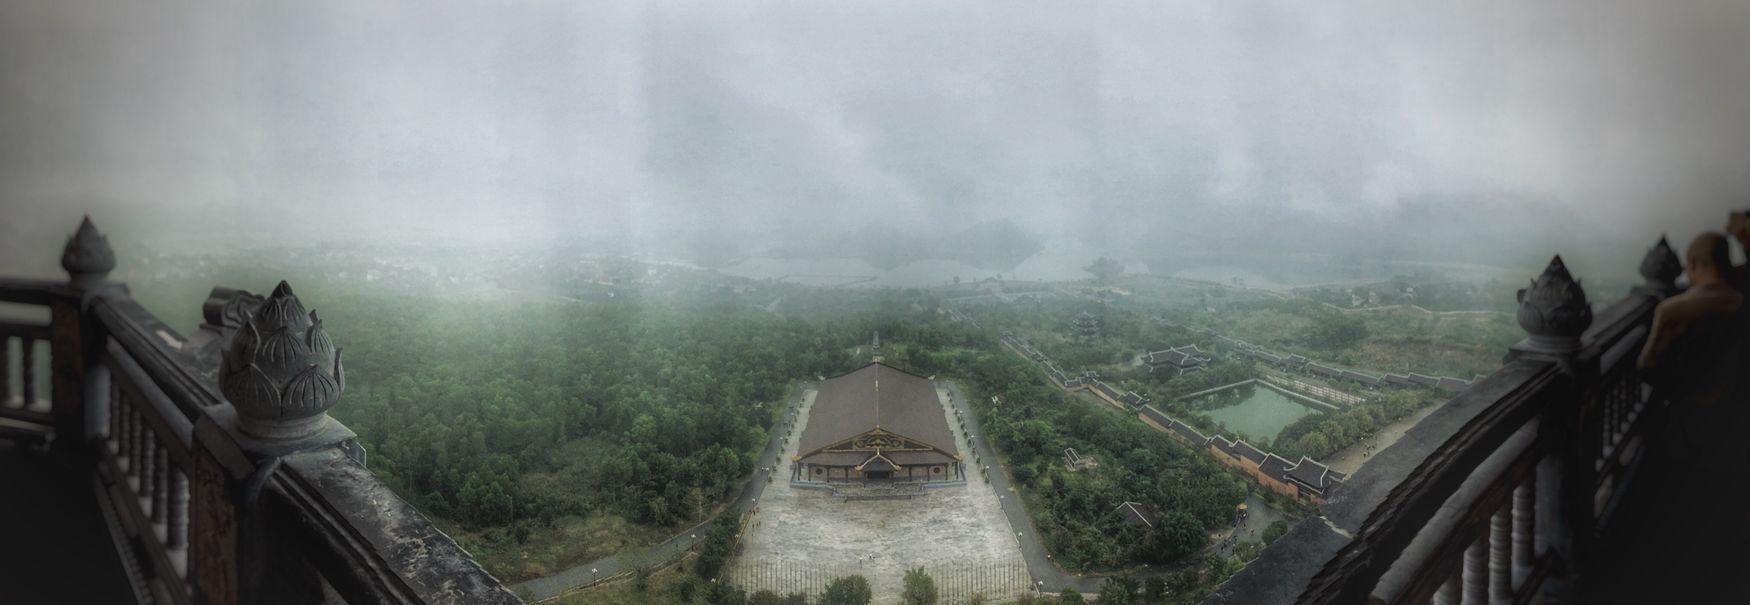 Travel Outdoors Beauty In Nature BaiDinh Pagoda High Sky Viet Nam